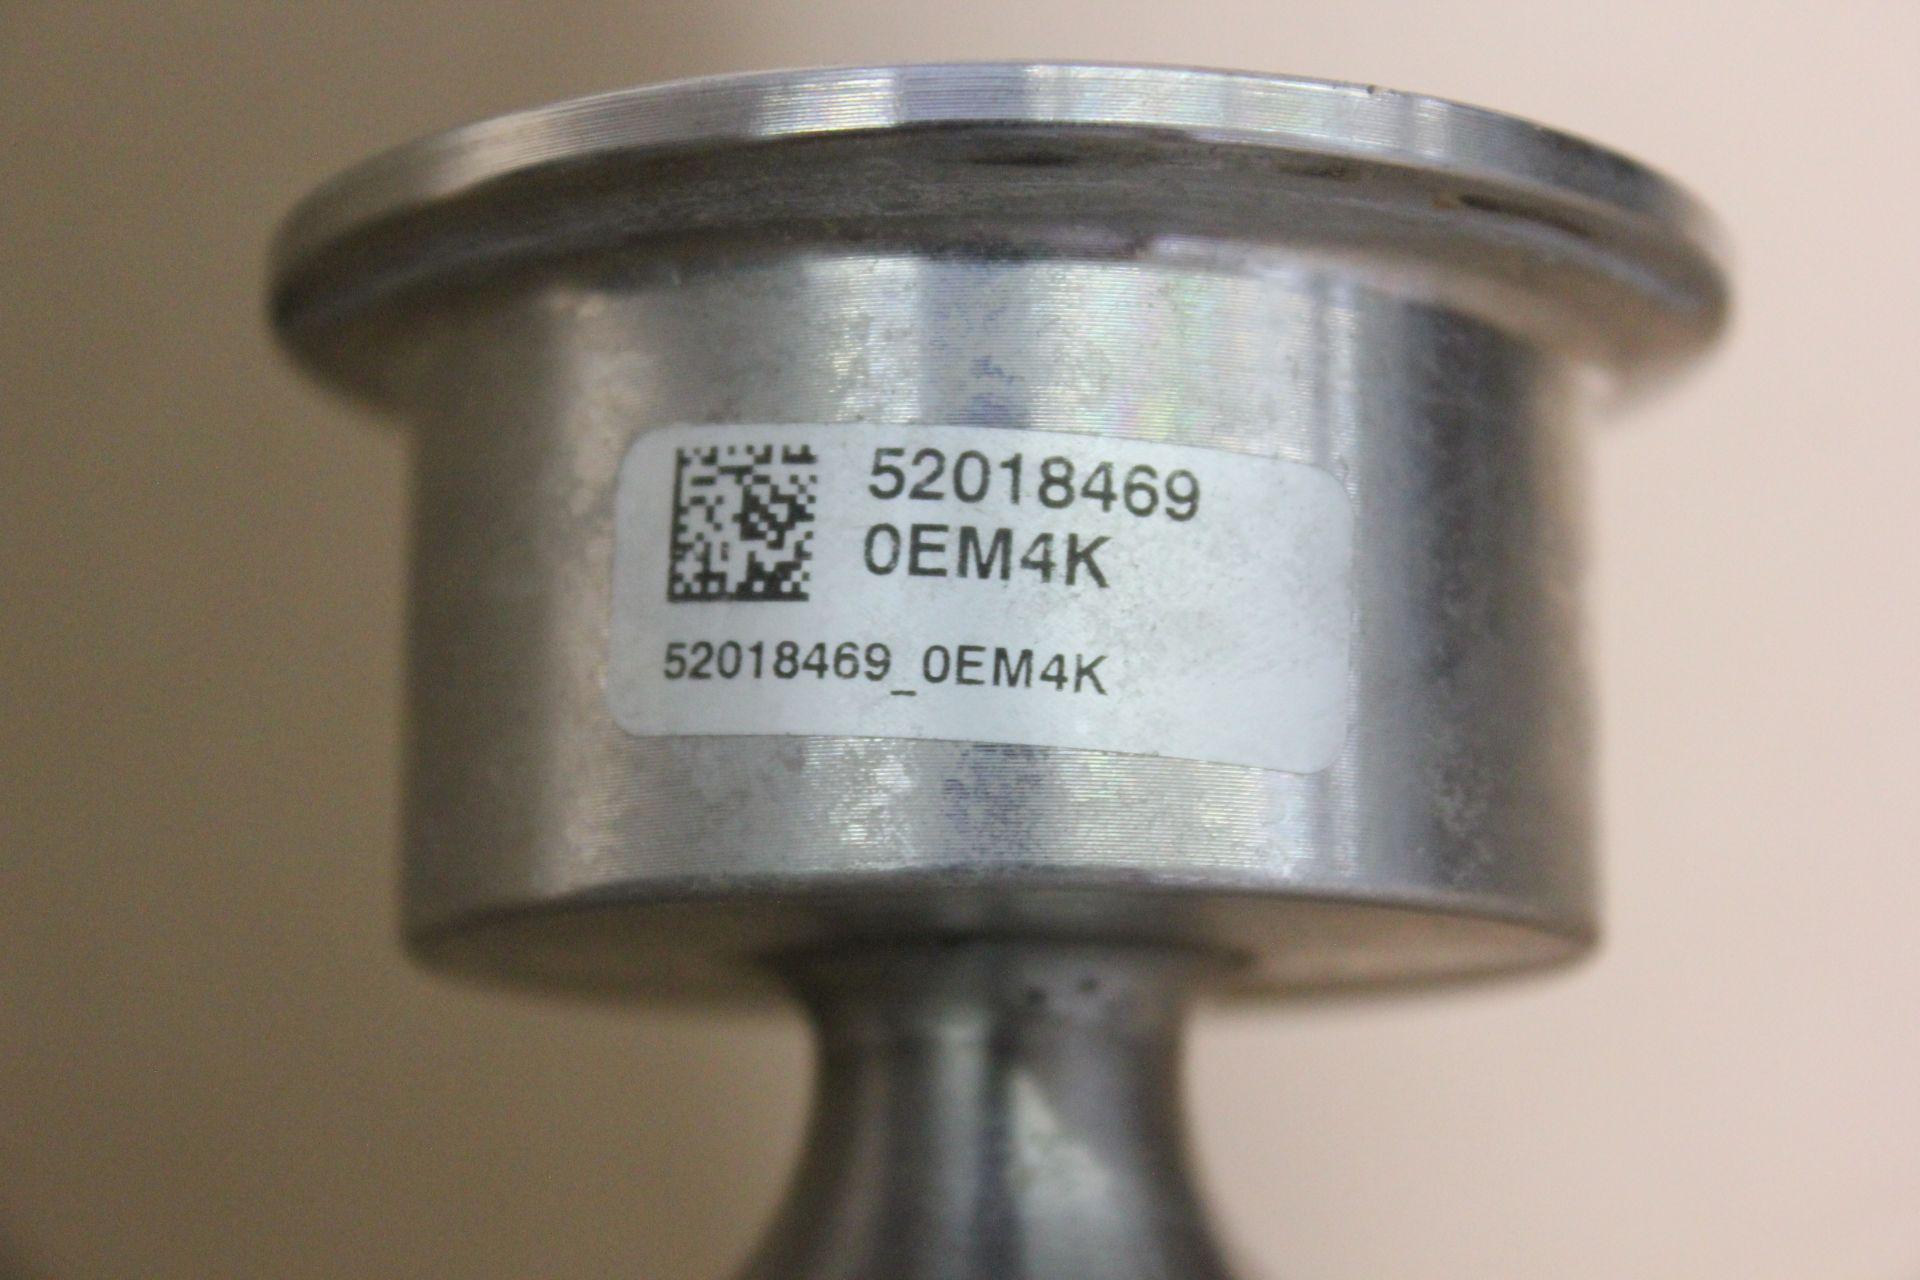 ENDRESS HAUSER CERABAR S DIGITAL PRESSURE TRANSMITTER - Image 2 of 4